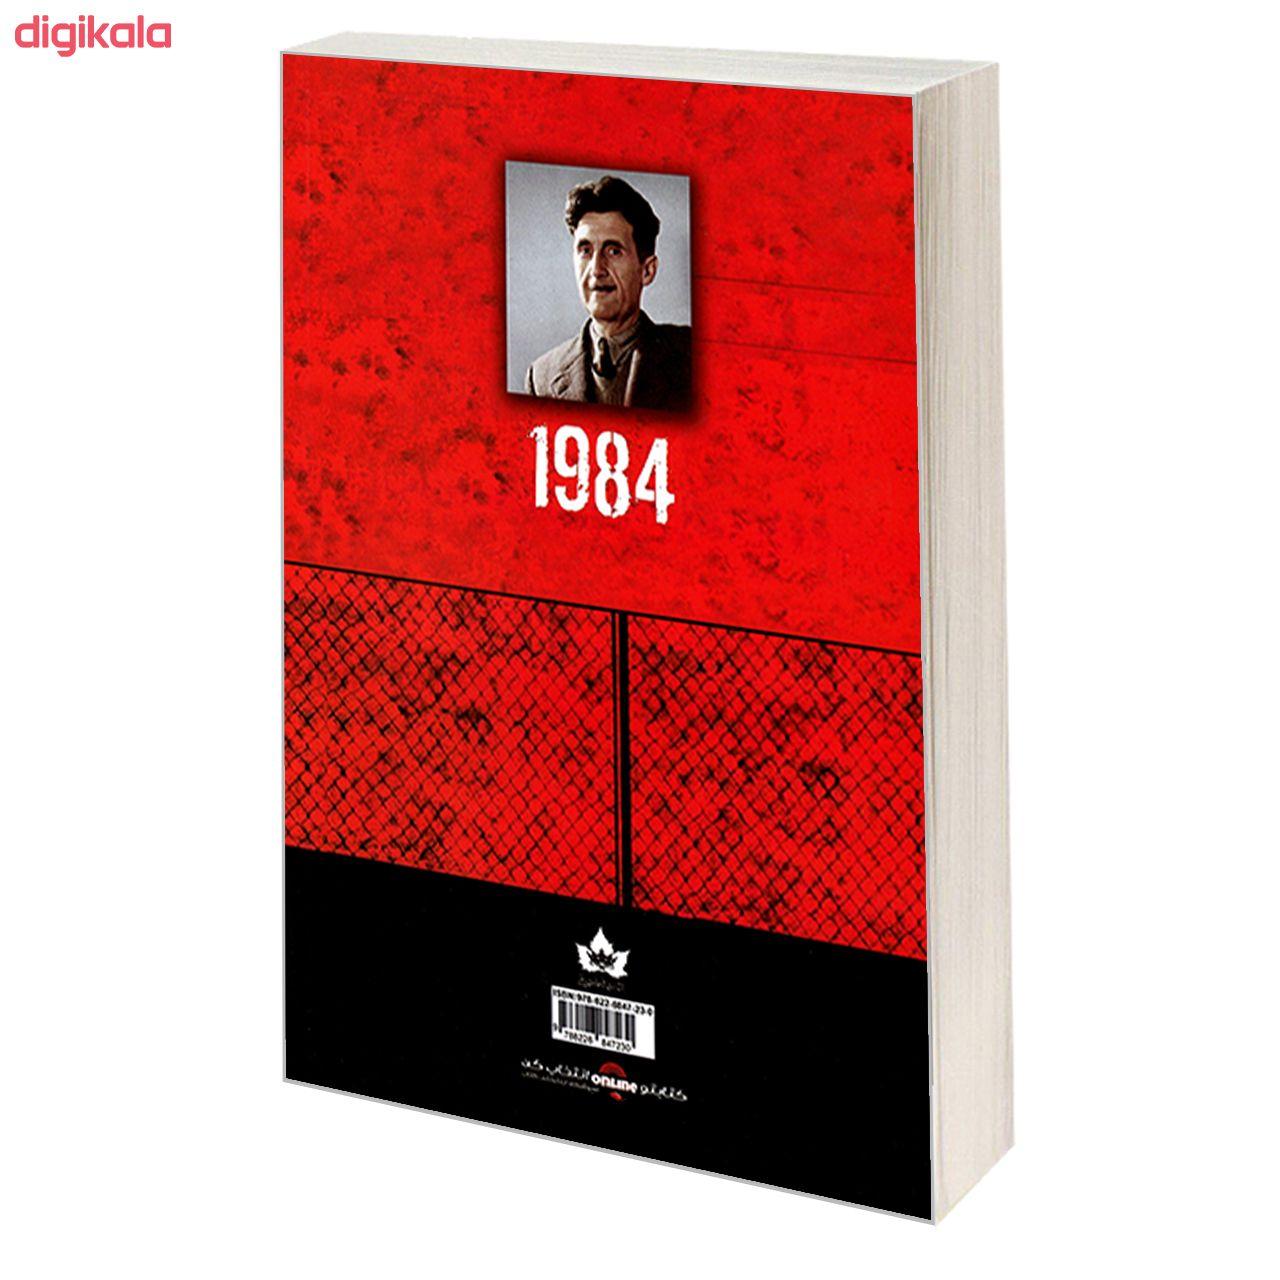 کتاب 1984 اثر جورج اورول نشر شاهدخت پاییز main 1 1